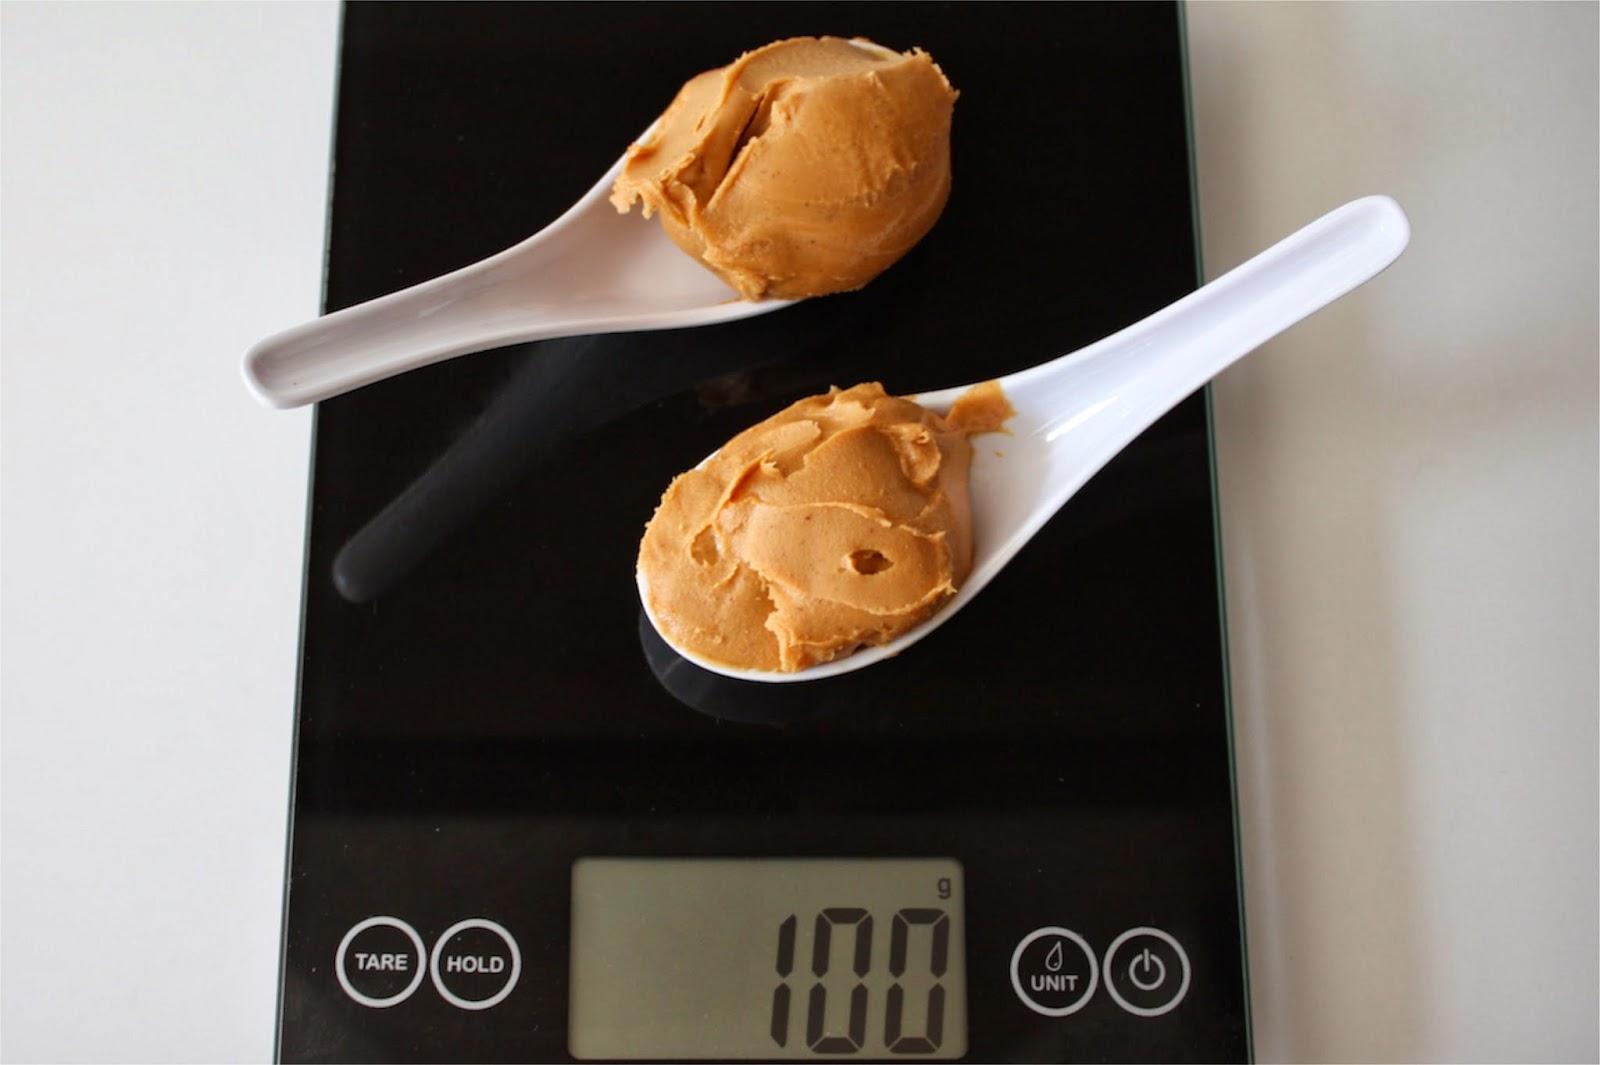 100 Grams of Peanut Butter